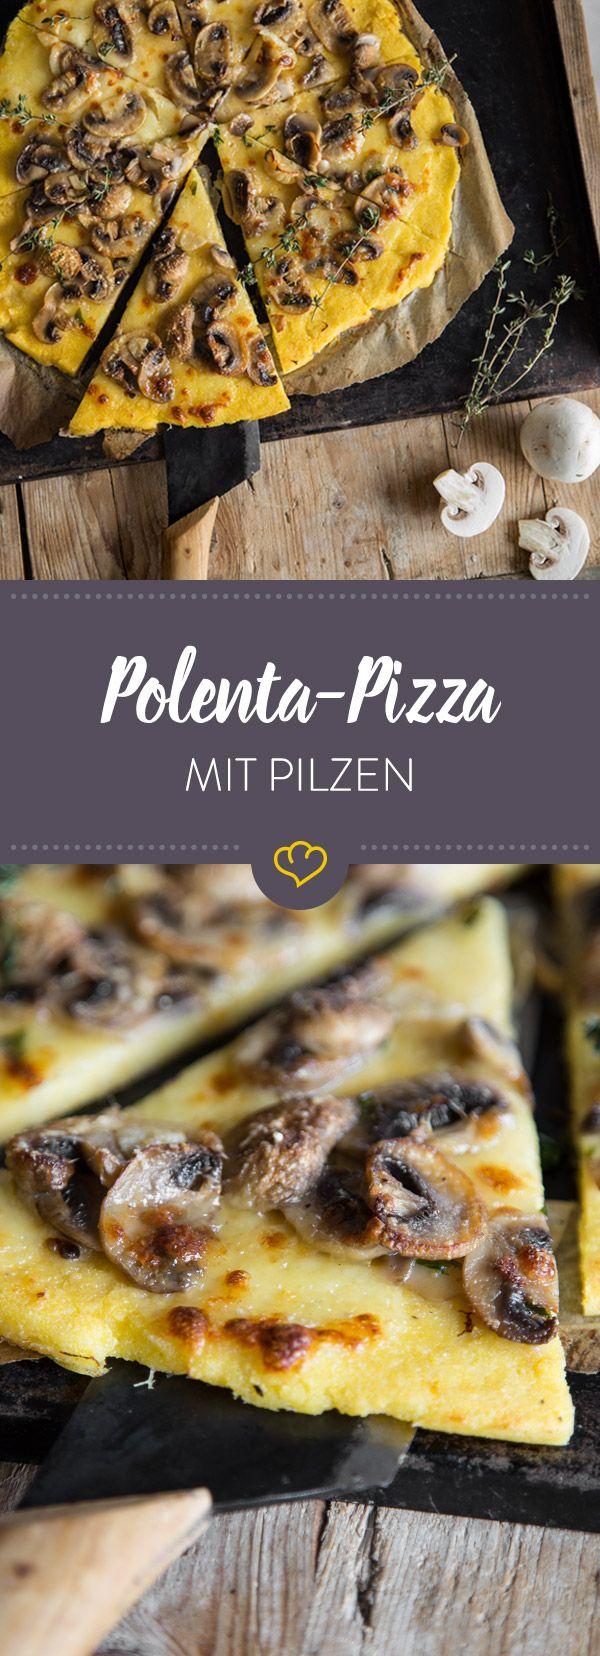 Photo of Quick polenta pizza with mushrooms and mozzarella